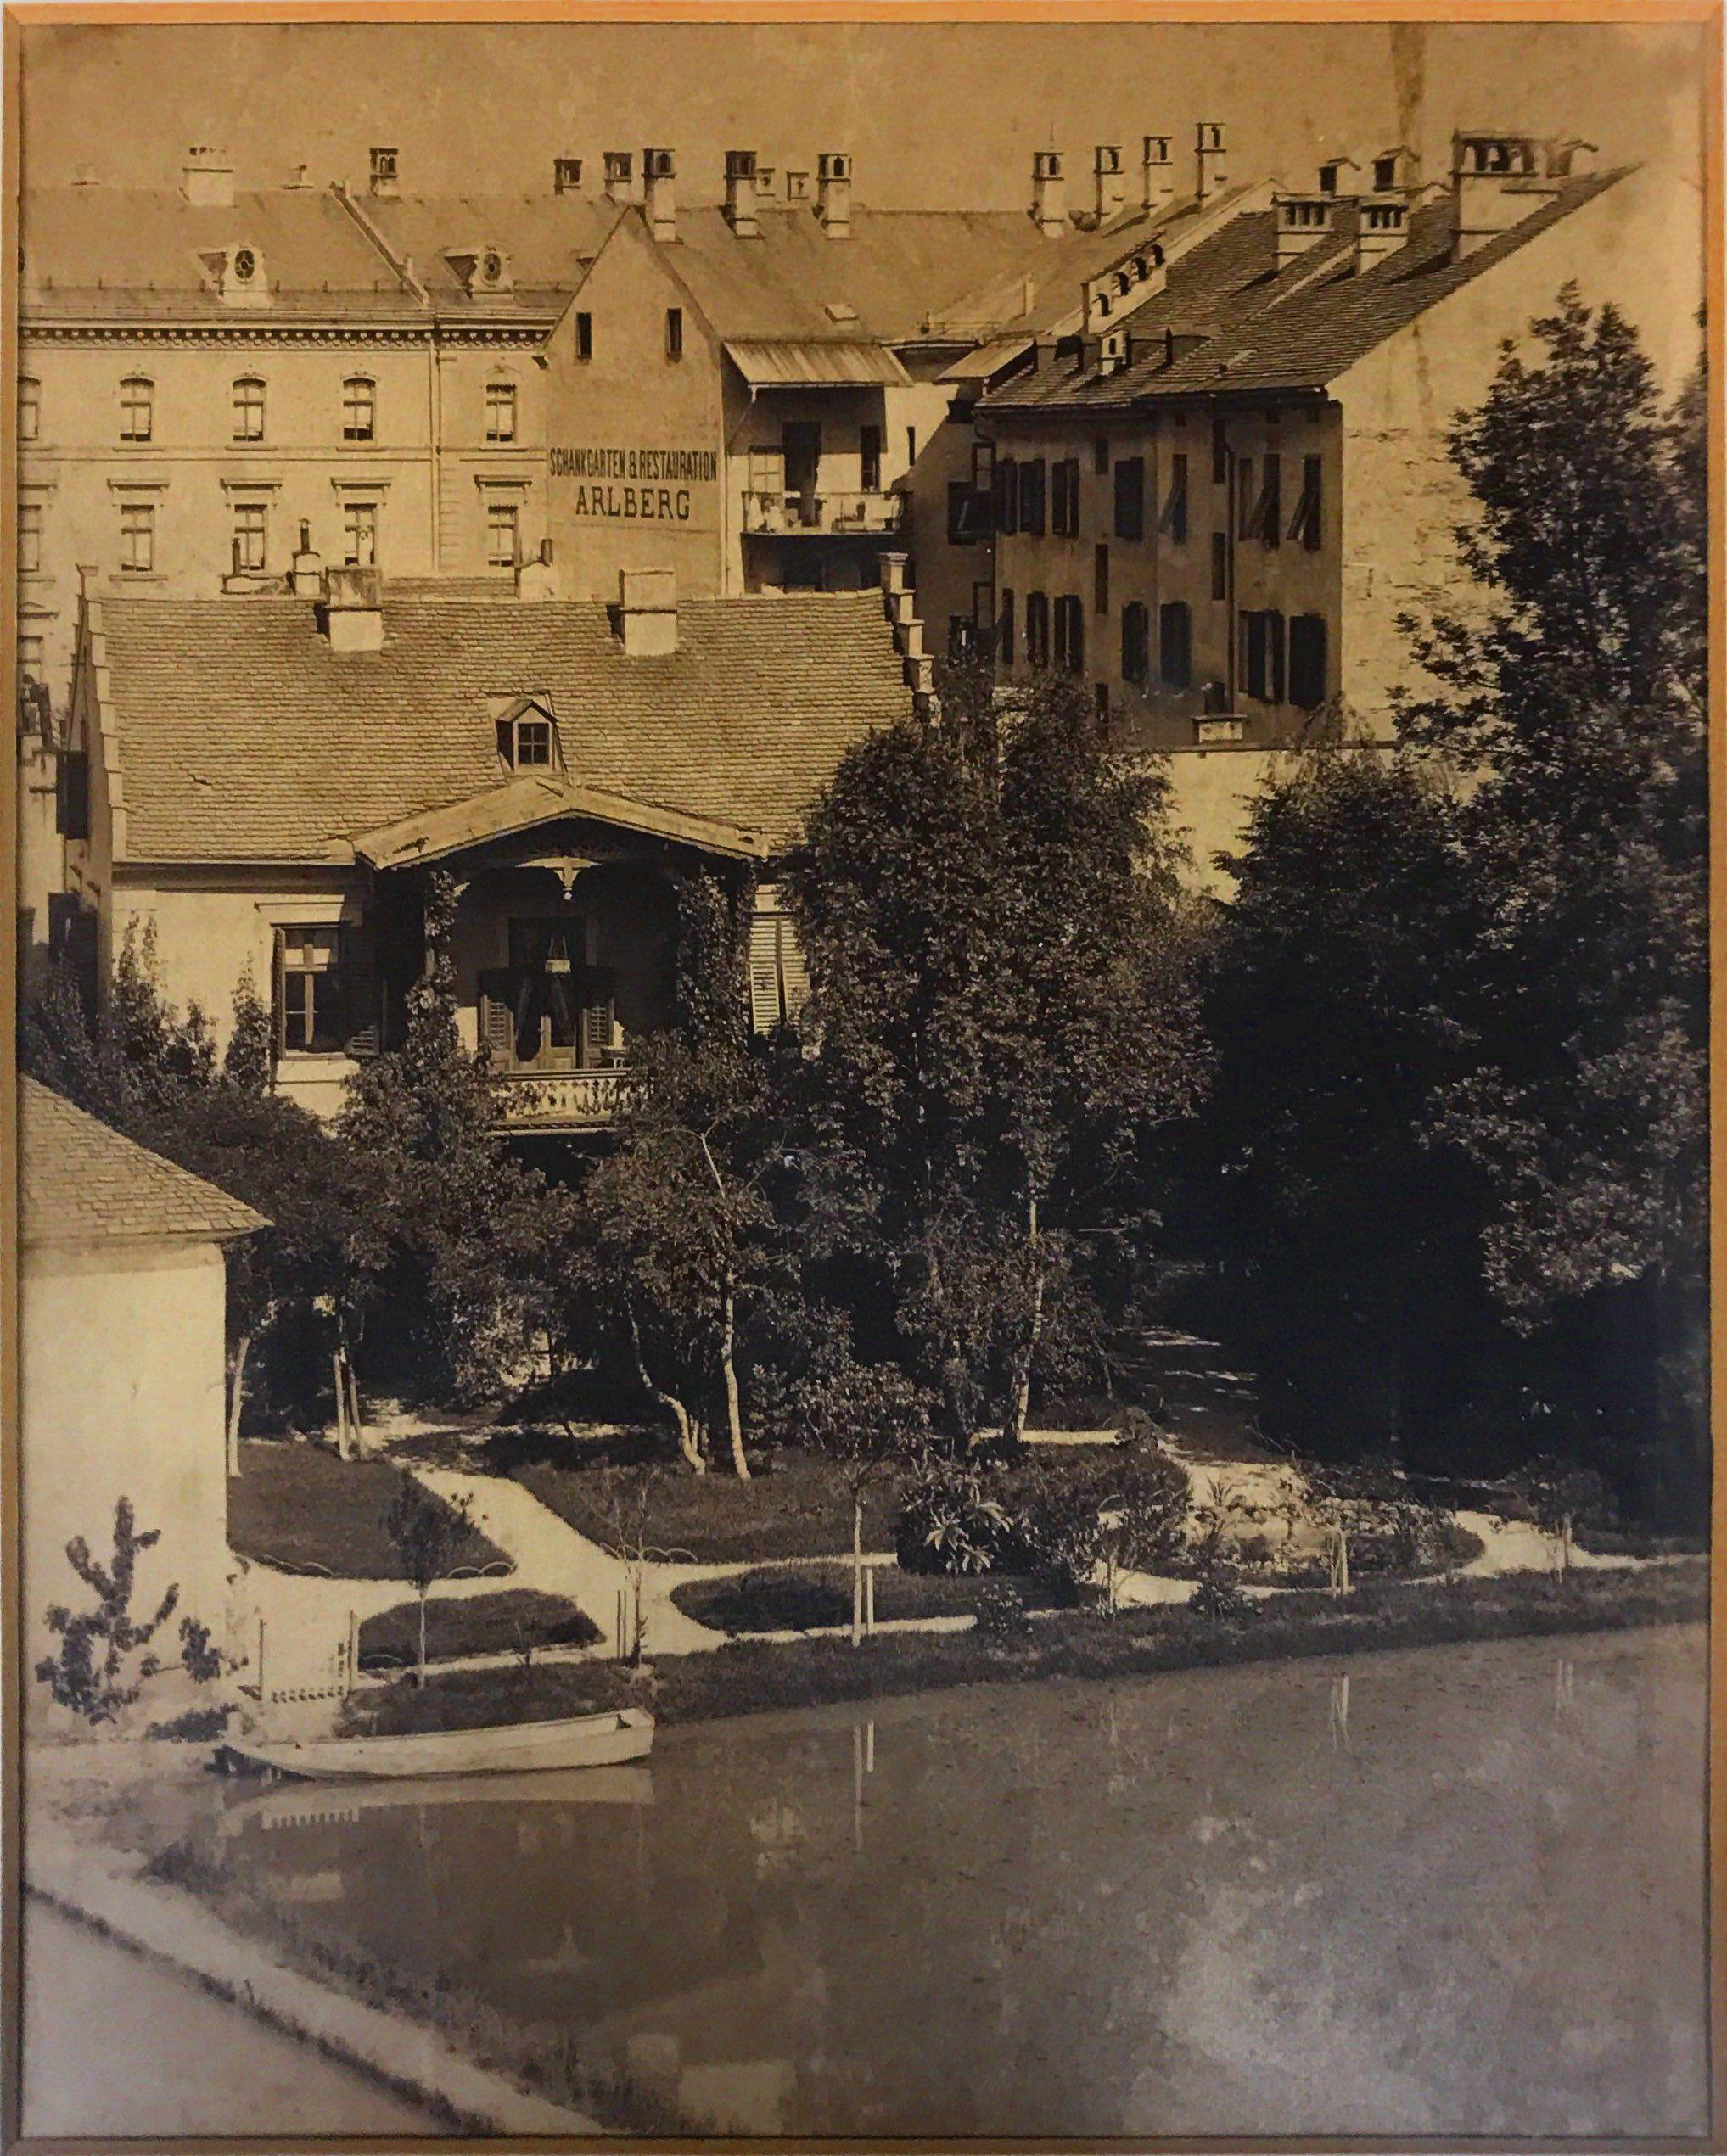 Innsbruck: Klein-Venedig?